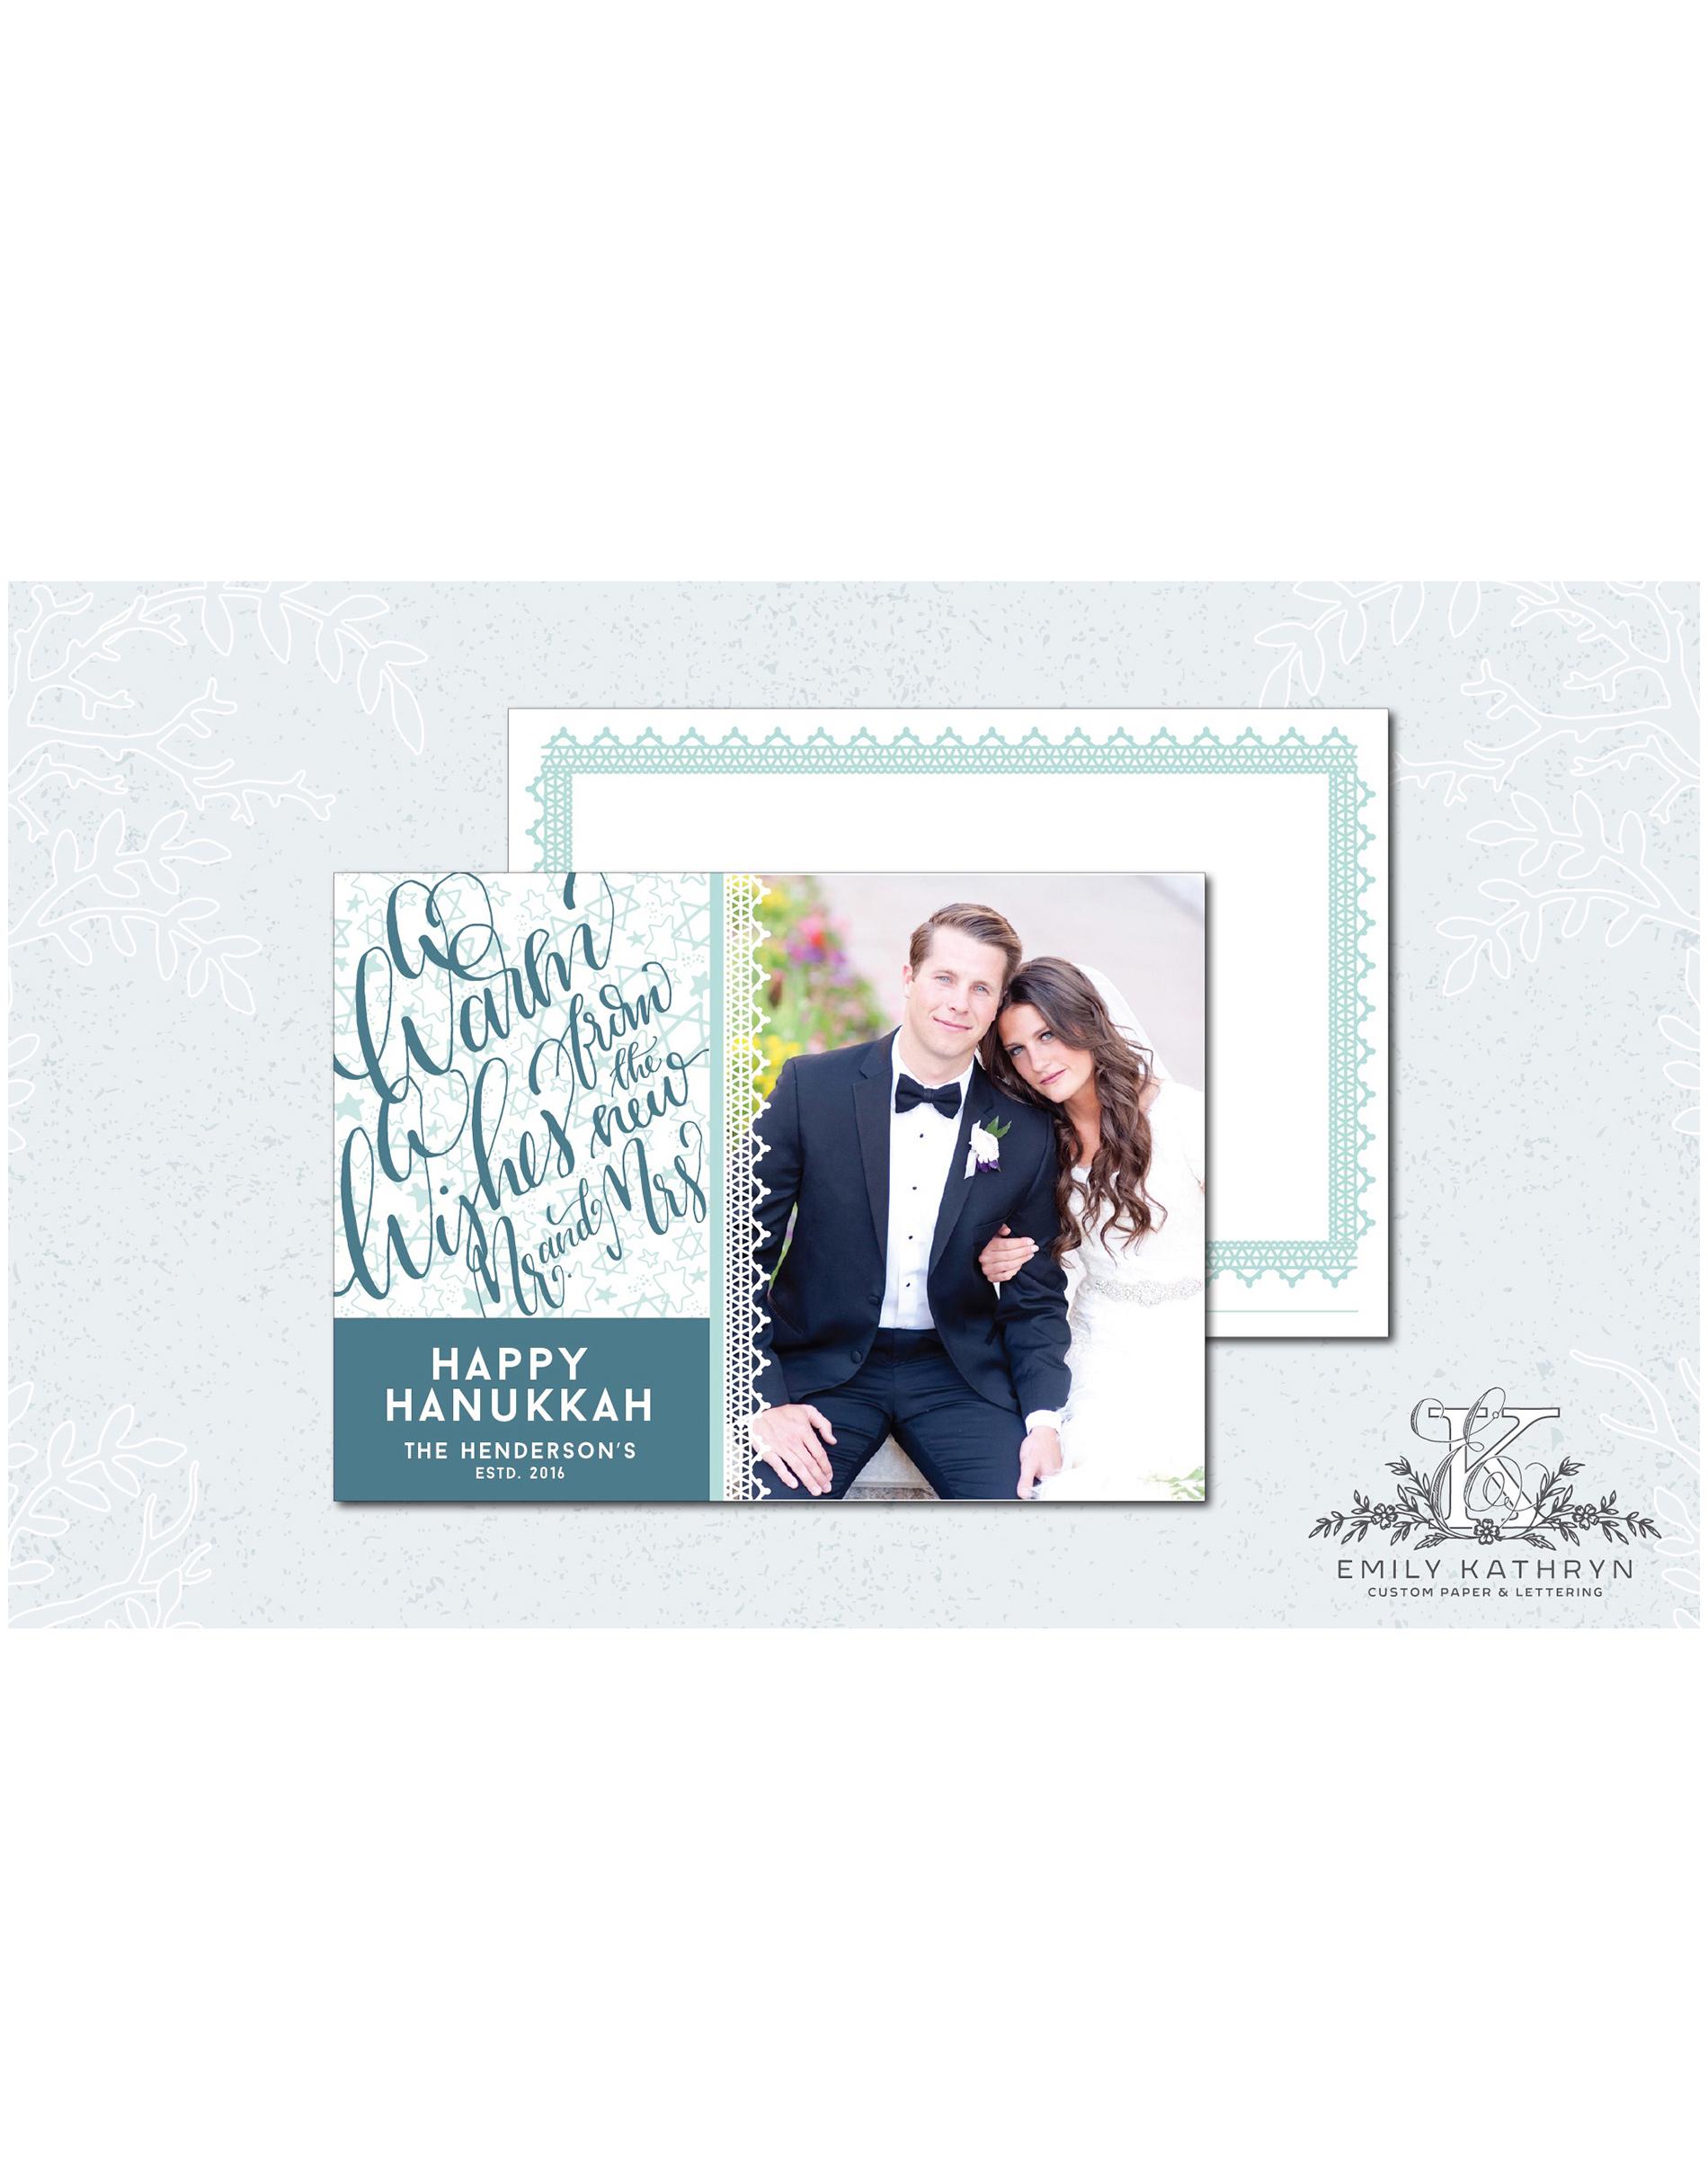 newlywed holiday card warm wishes mr mrs